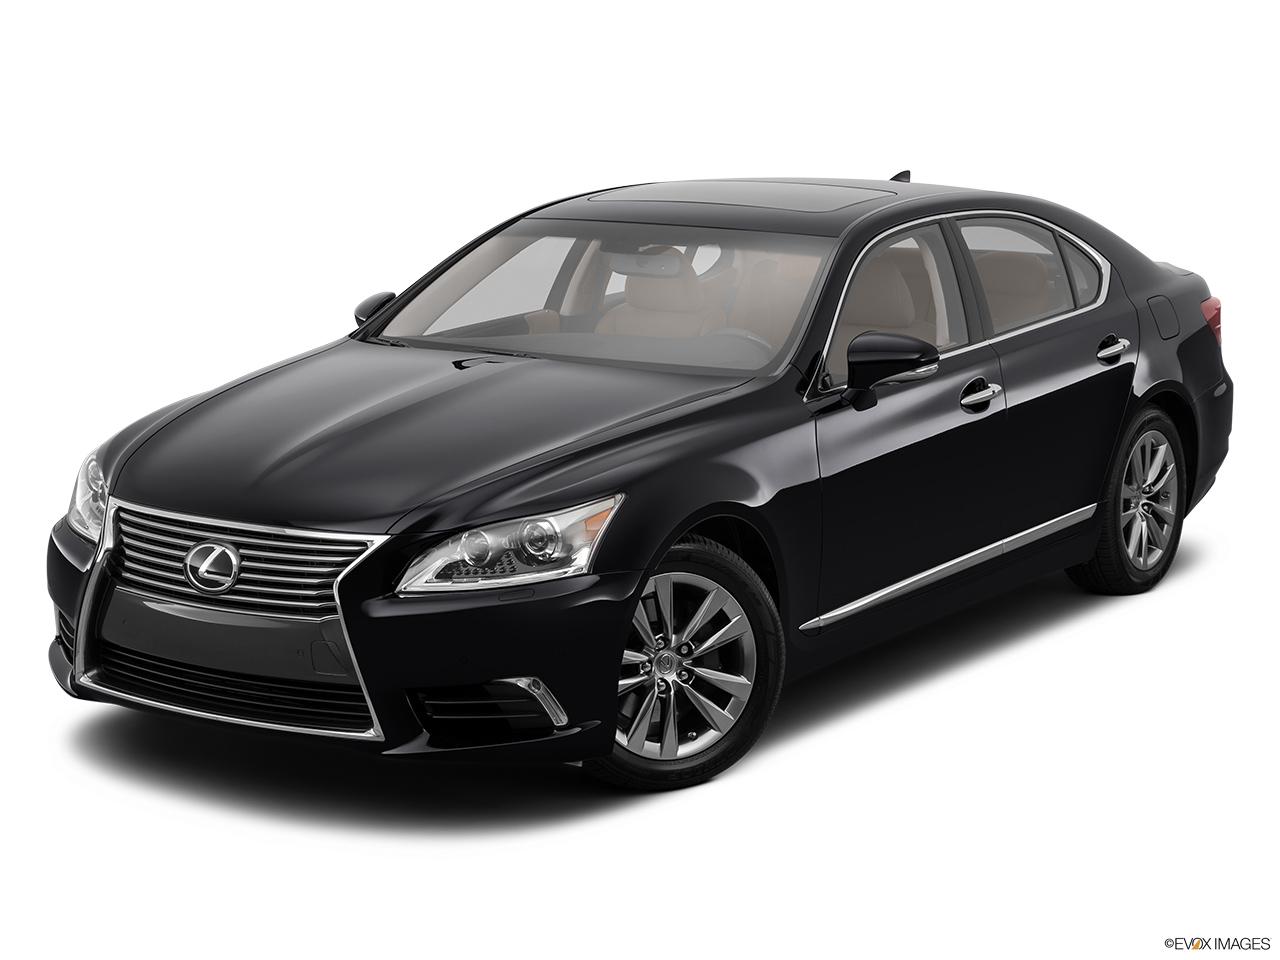 2014 lexus ls 600h l sedan hybrid front angle view